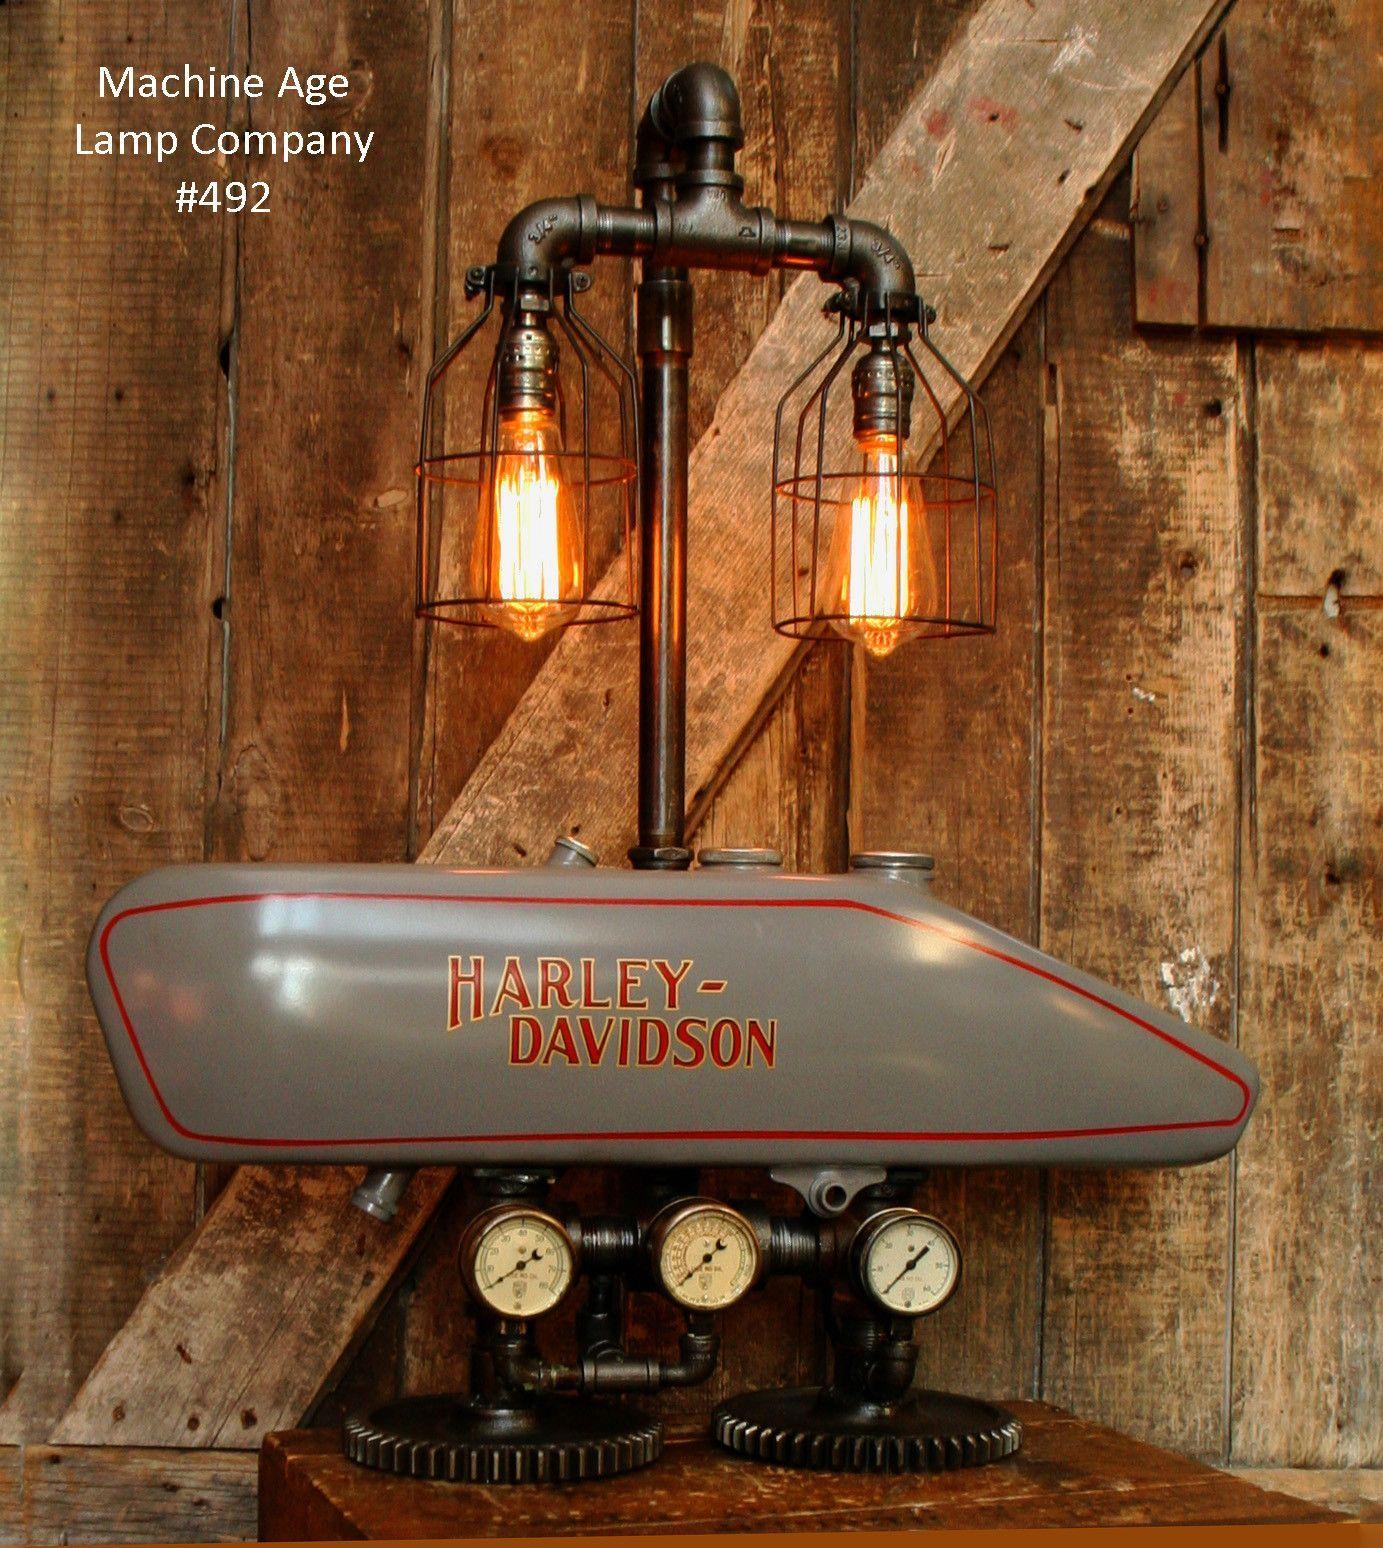 Steampunk Industrial Lamp, 1916 Antique Harley Davidson Motorcycle Gas Tank  Light   Lamp #492